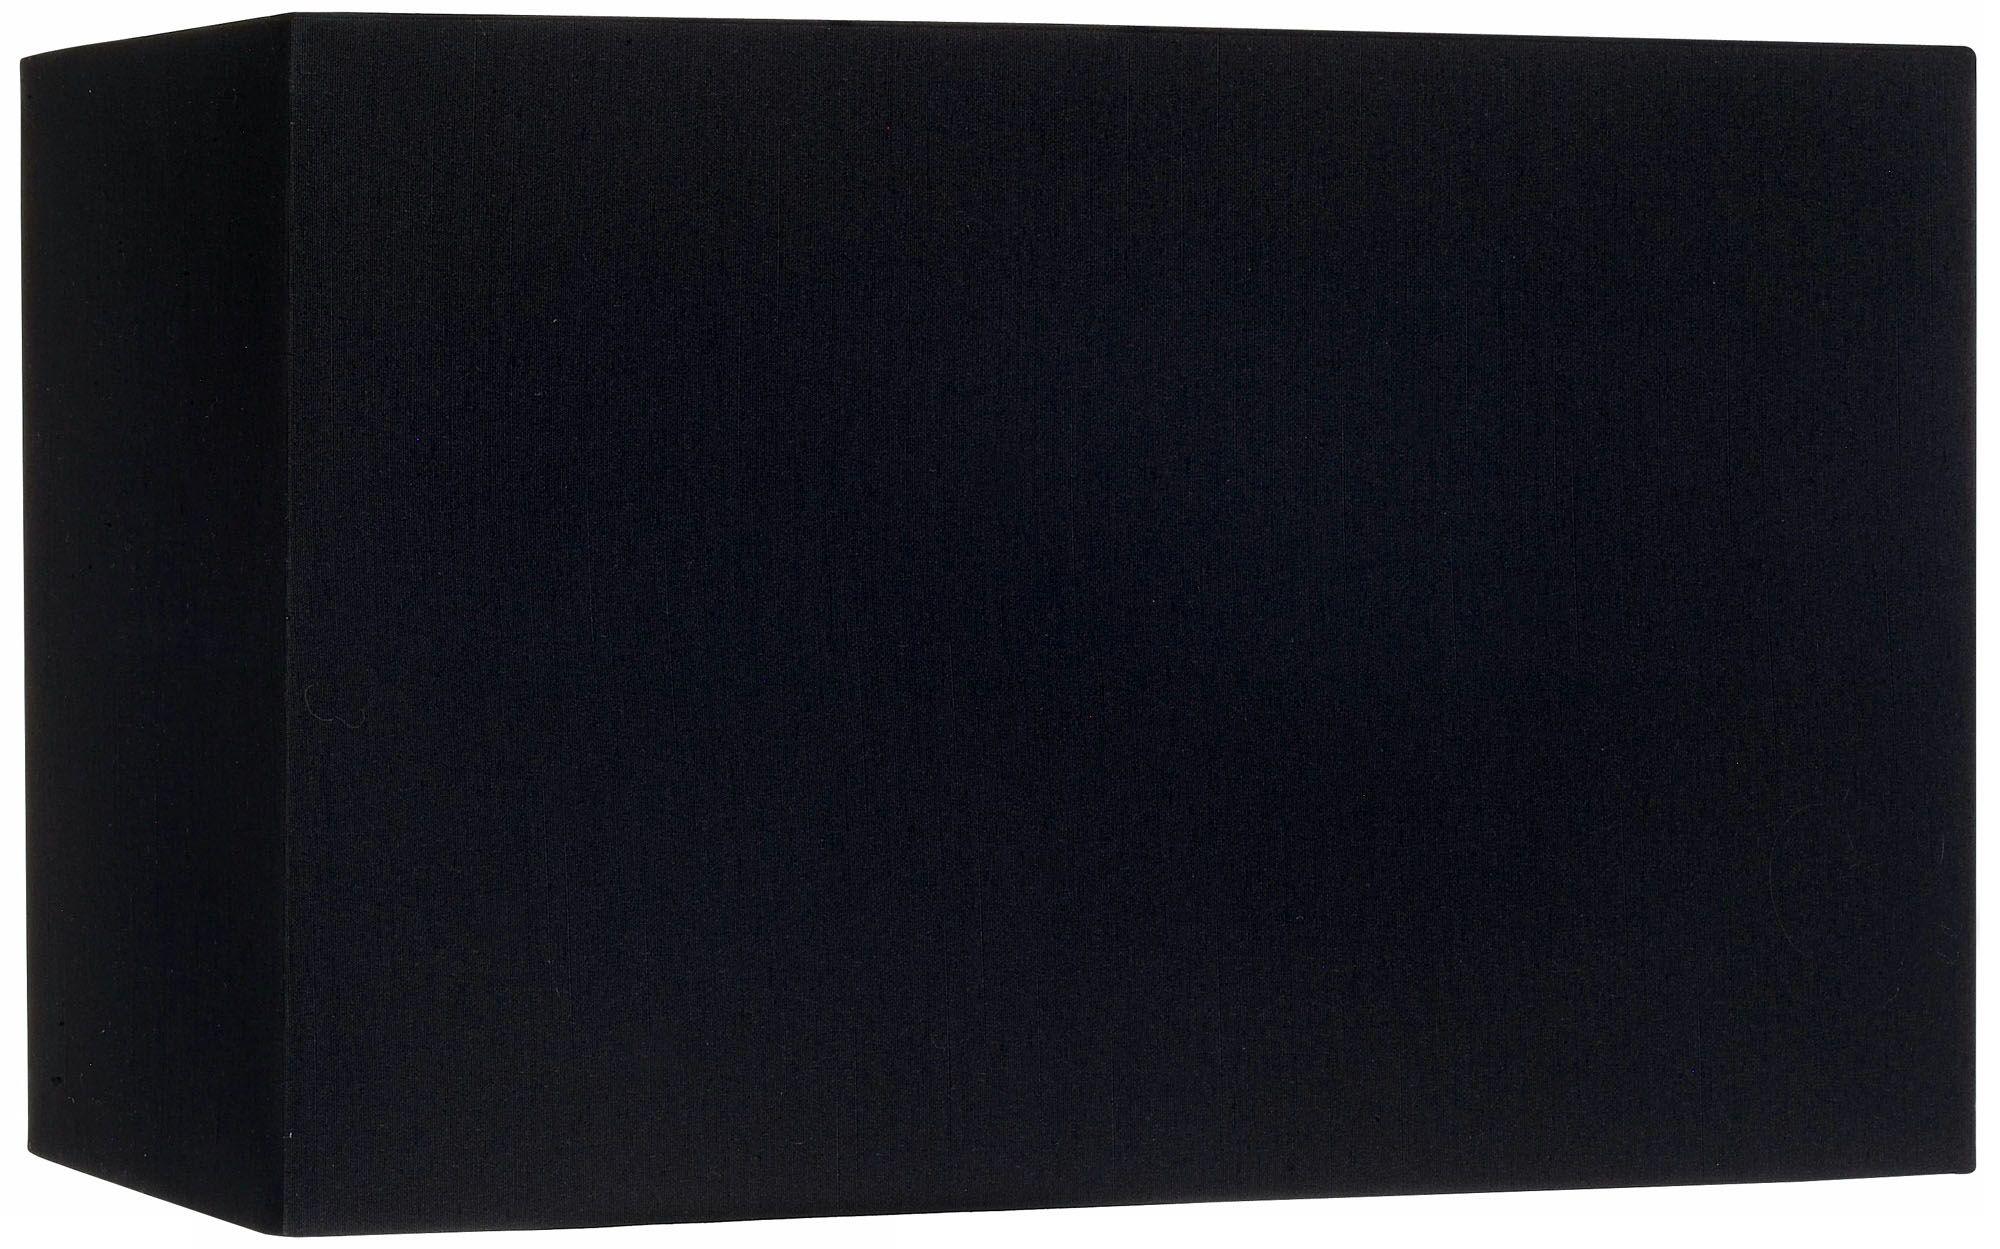 black rectangular hardback lamp shade 816x816x10 spider - Rectangular Lamp Shades